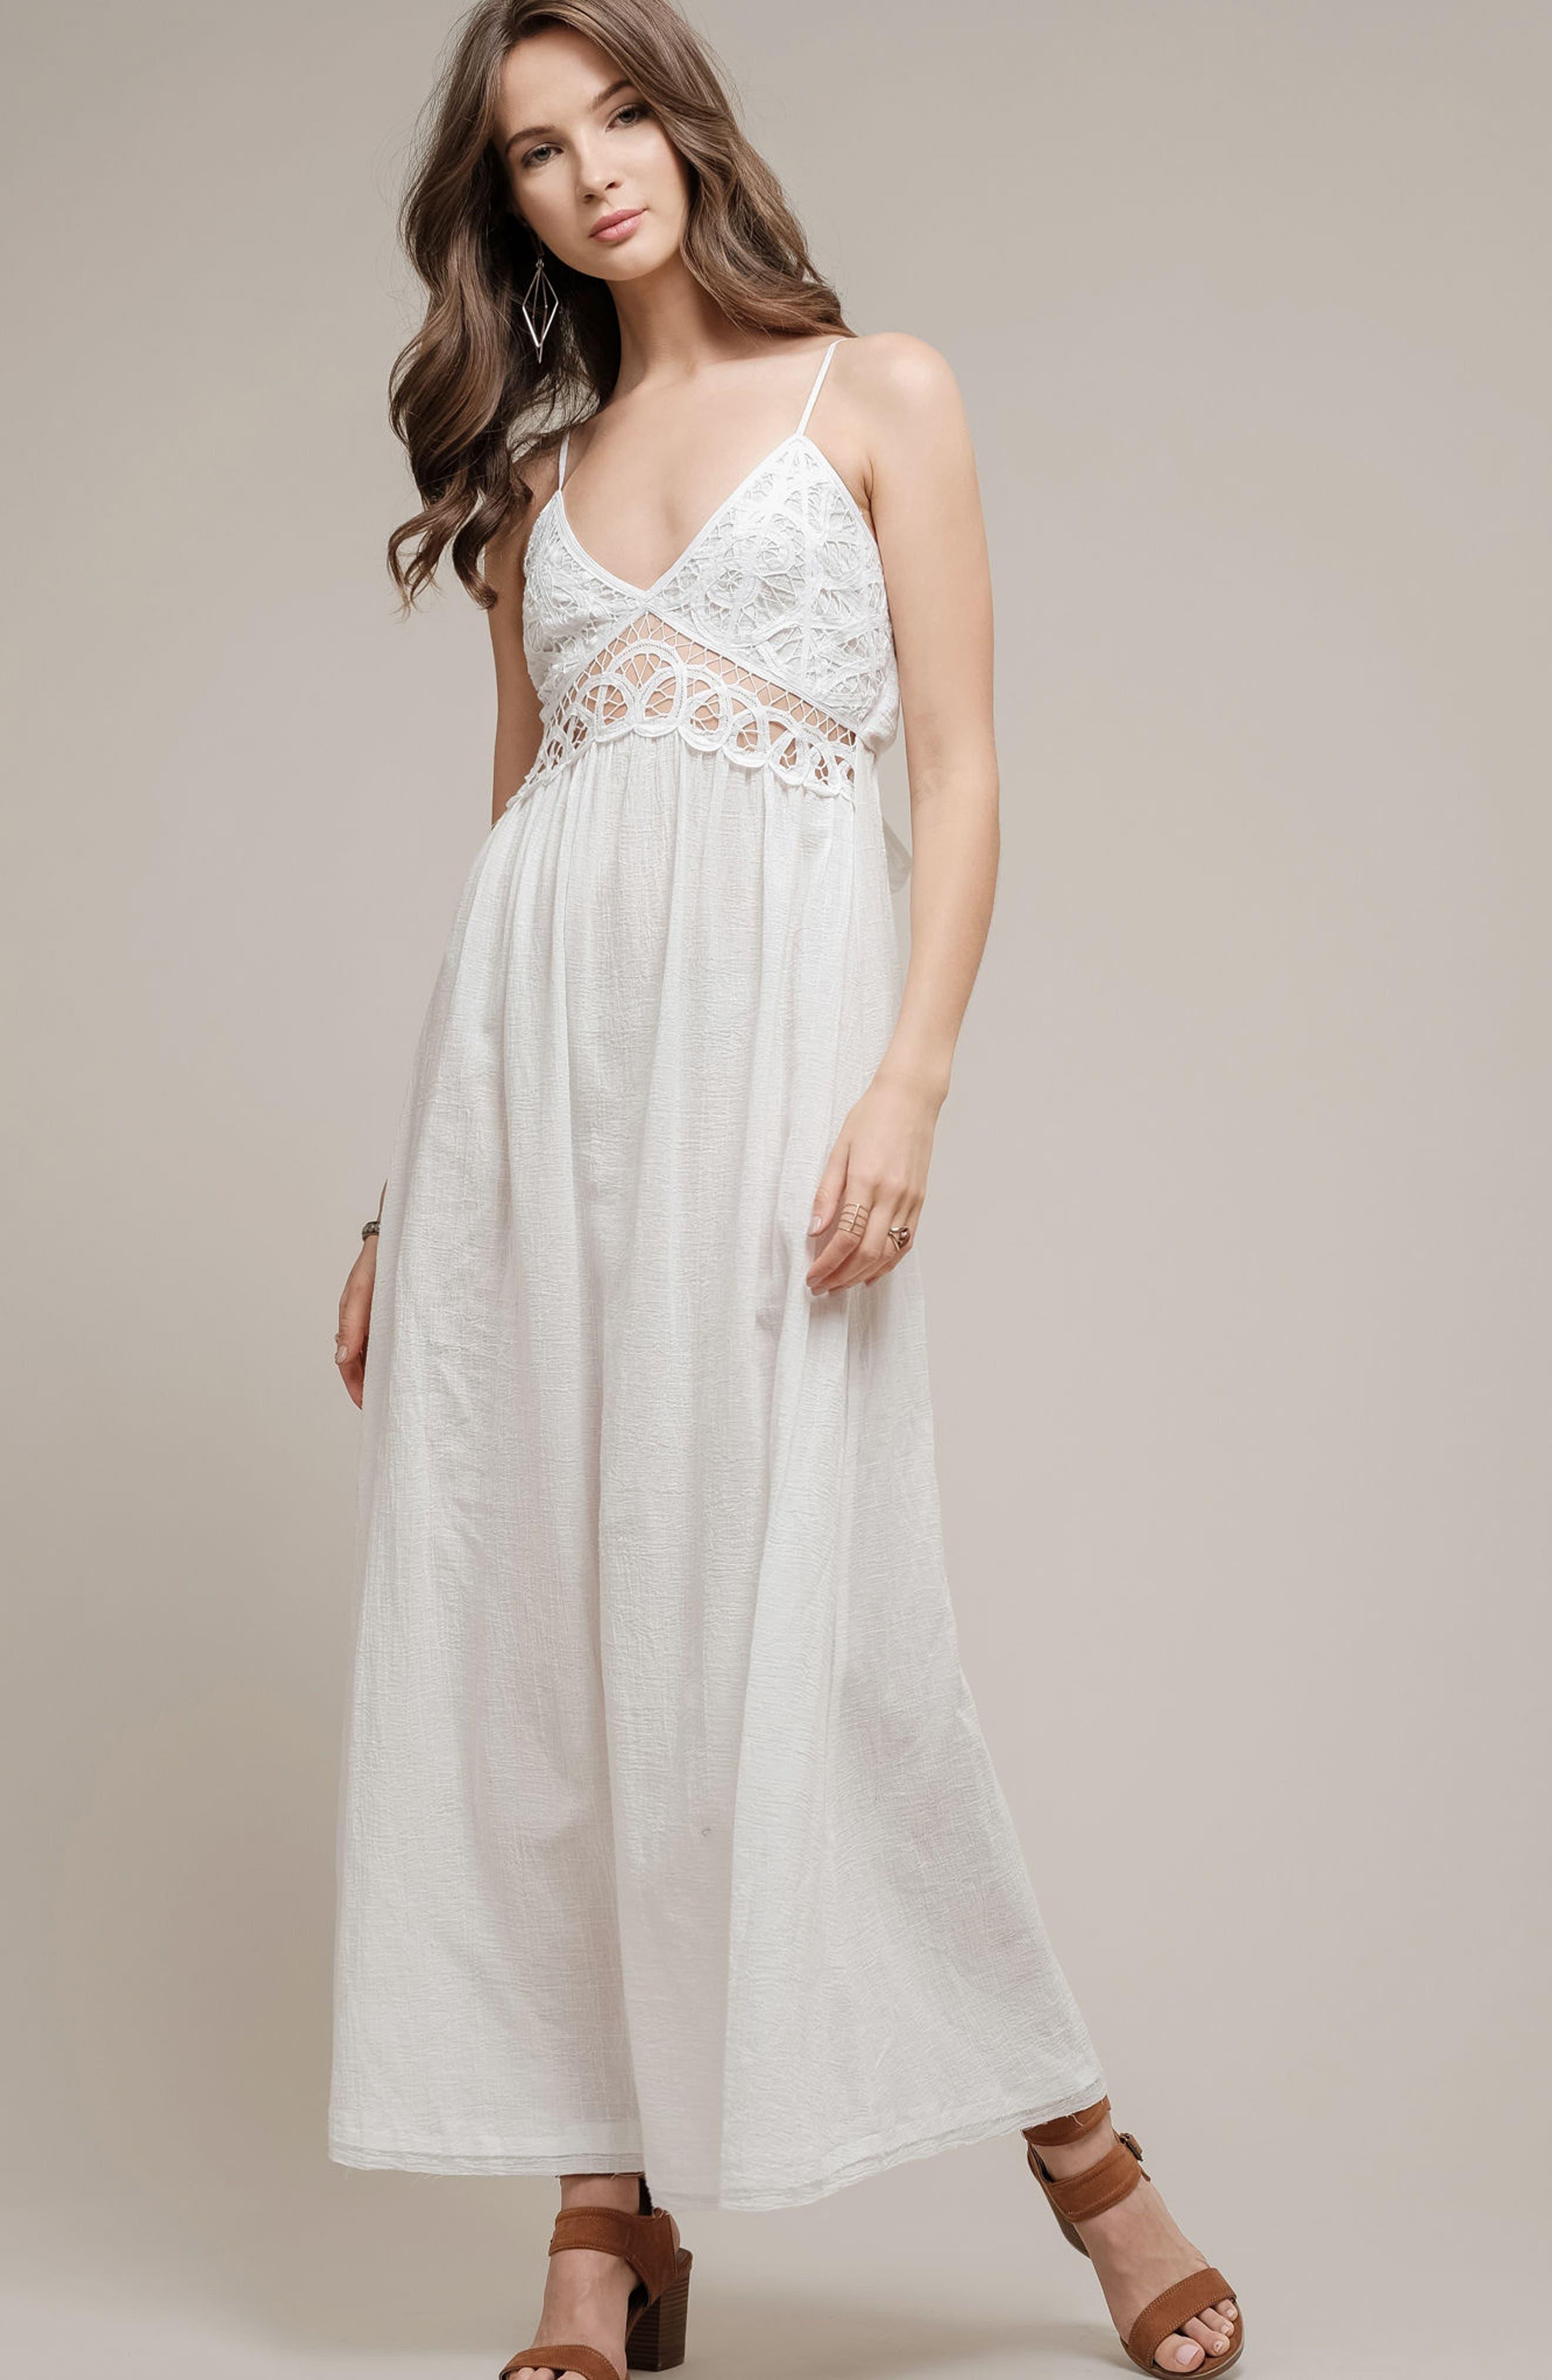 Lace Inset Empire Waist Maxi Dress,                             Alternate thumbnail 7, color,                             100